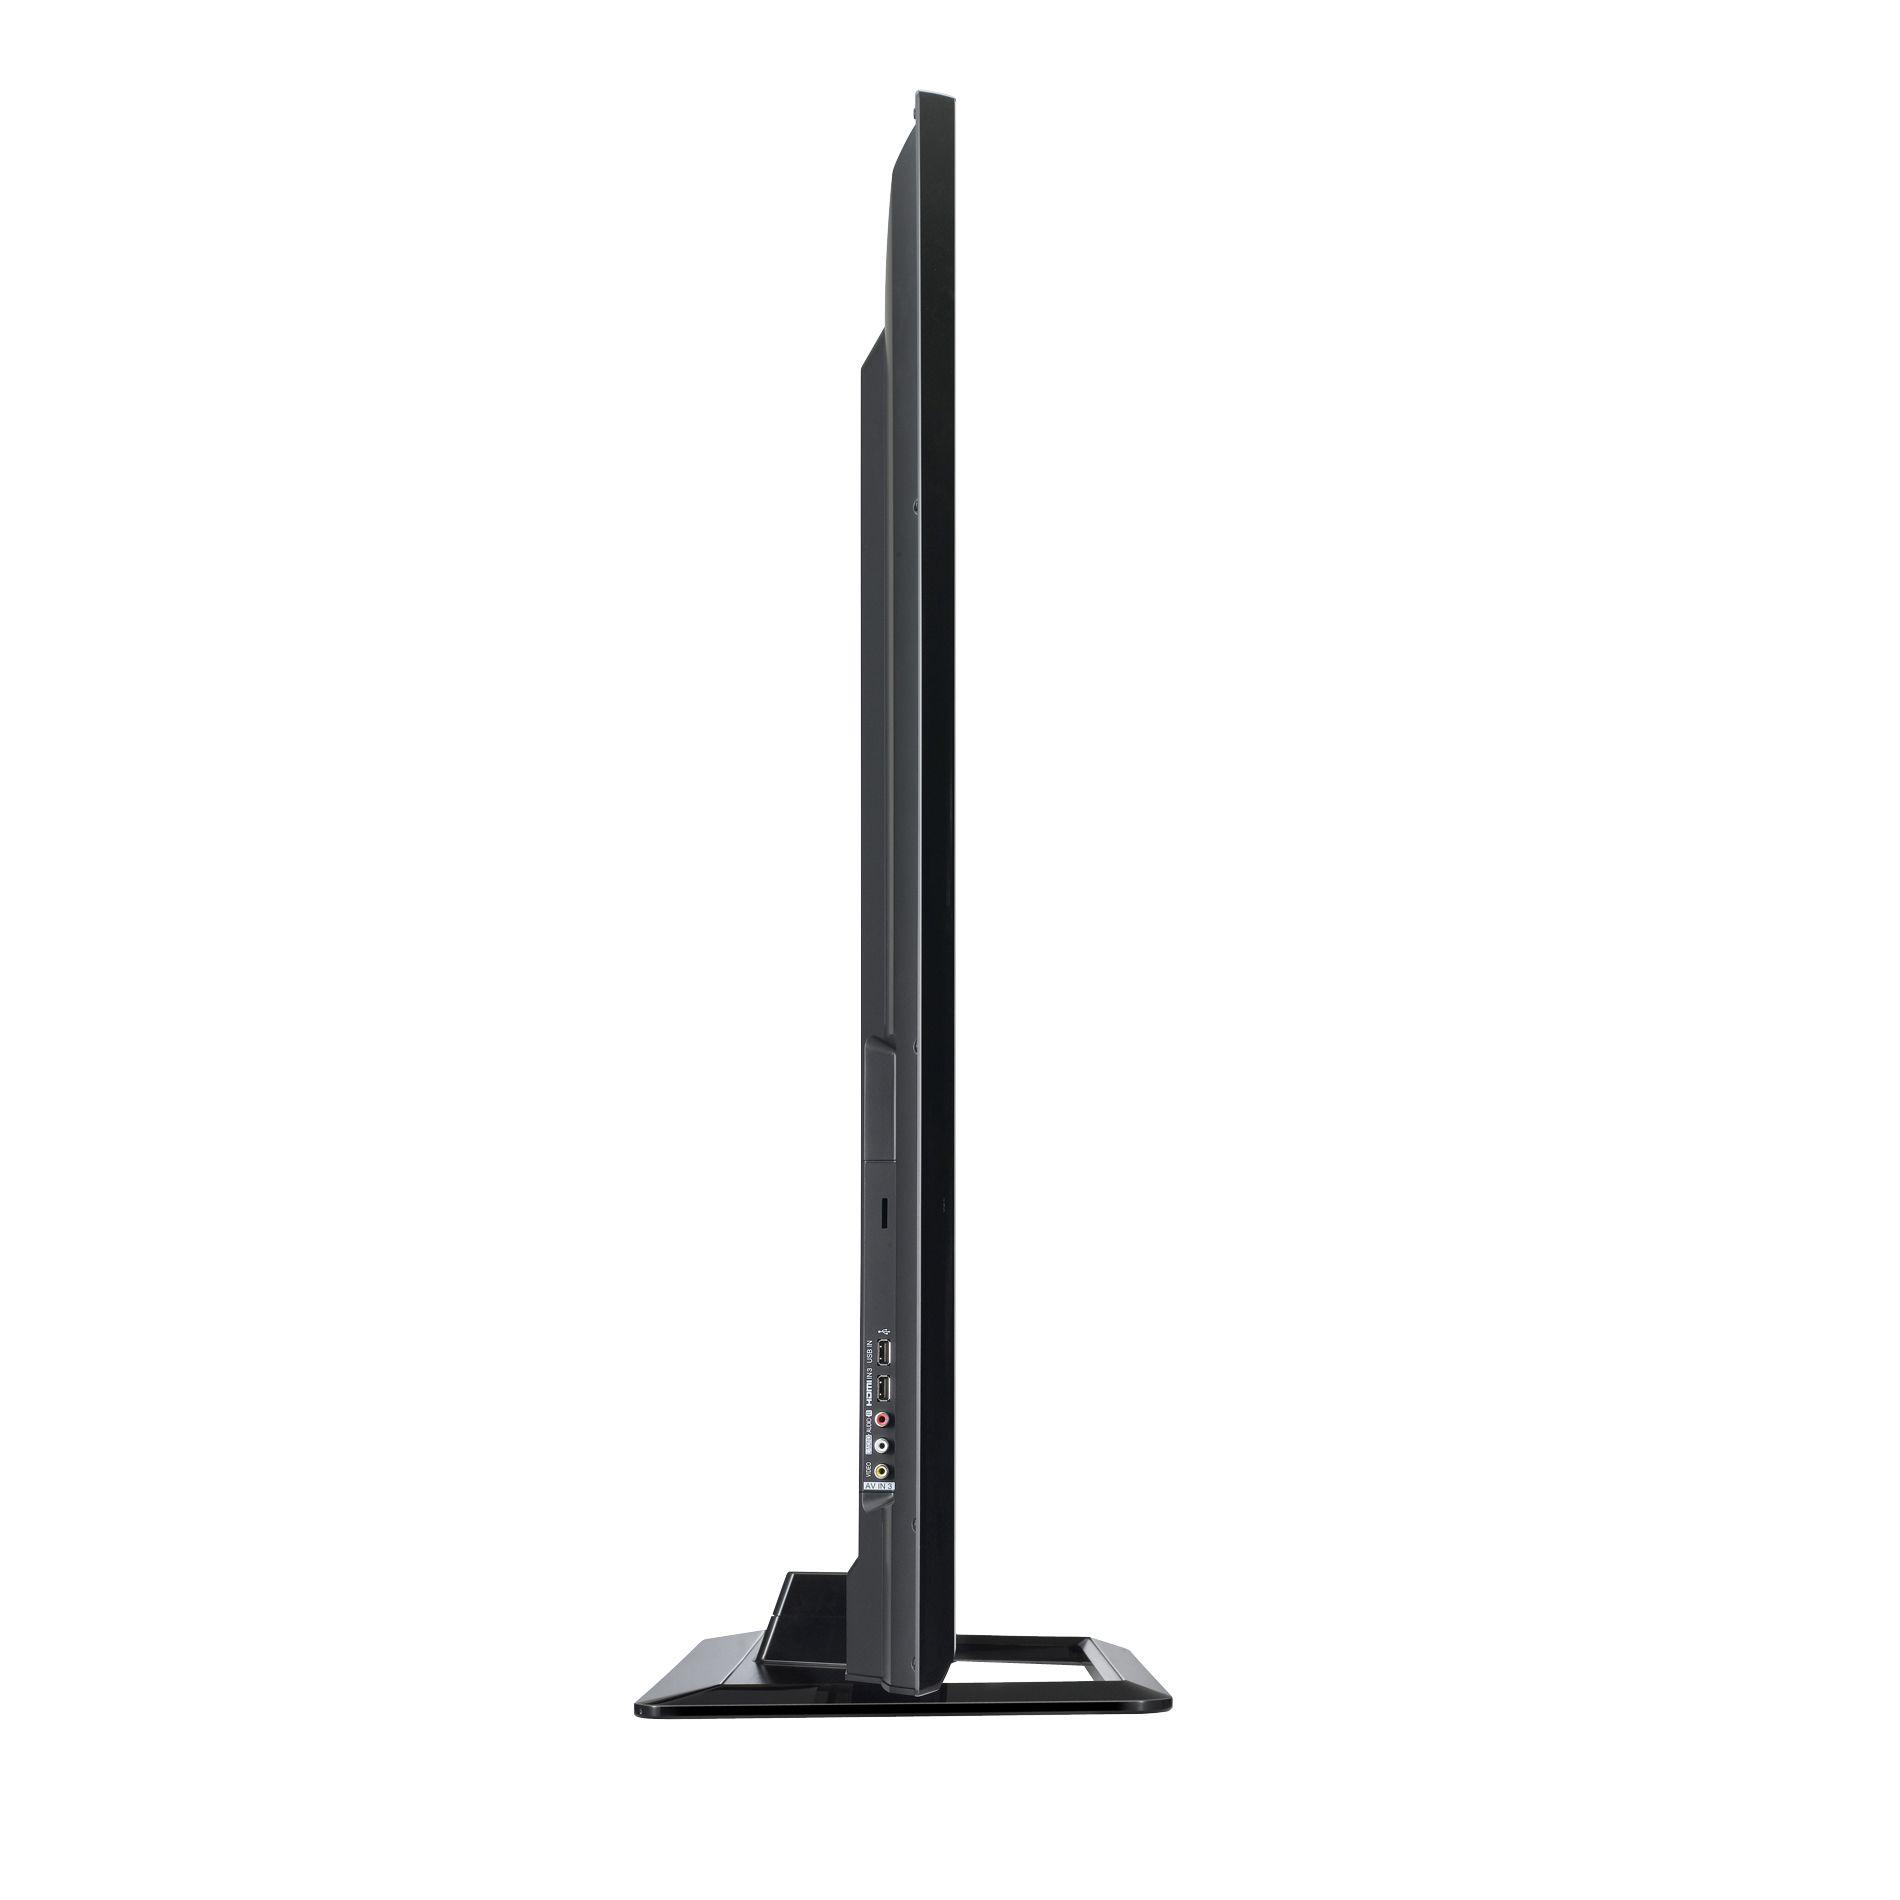 "LG 60"" Plasma HDTV - 60PA5500"